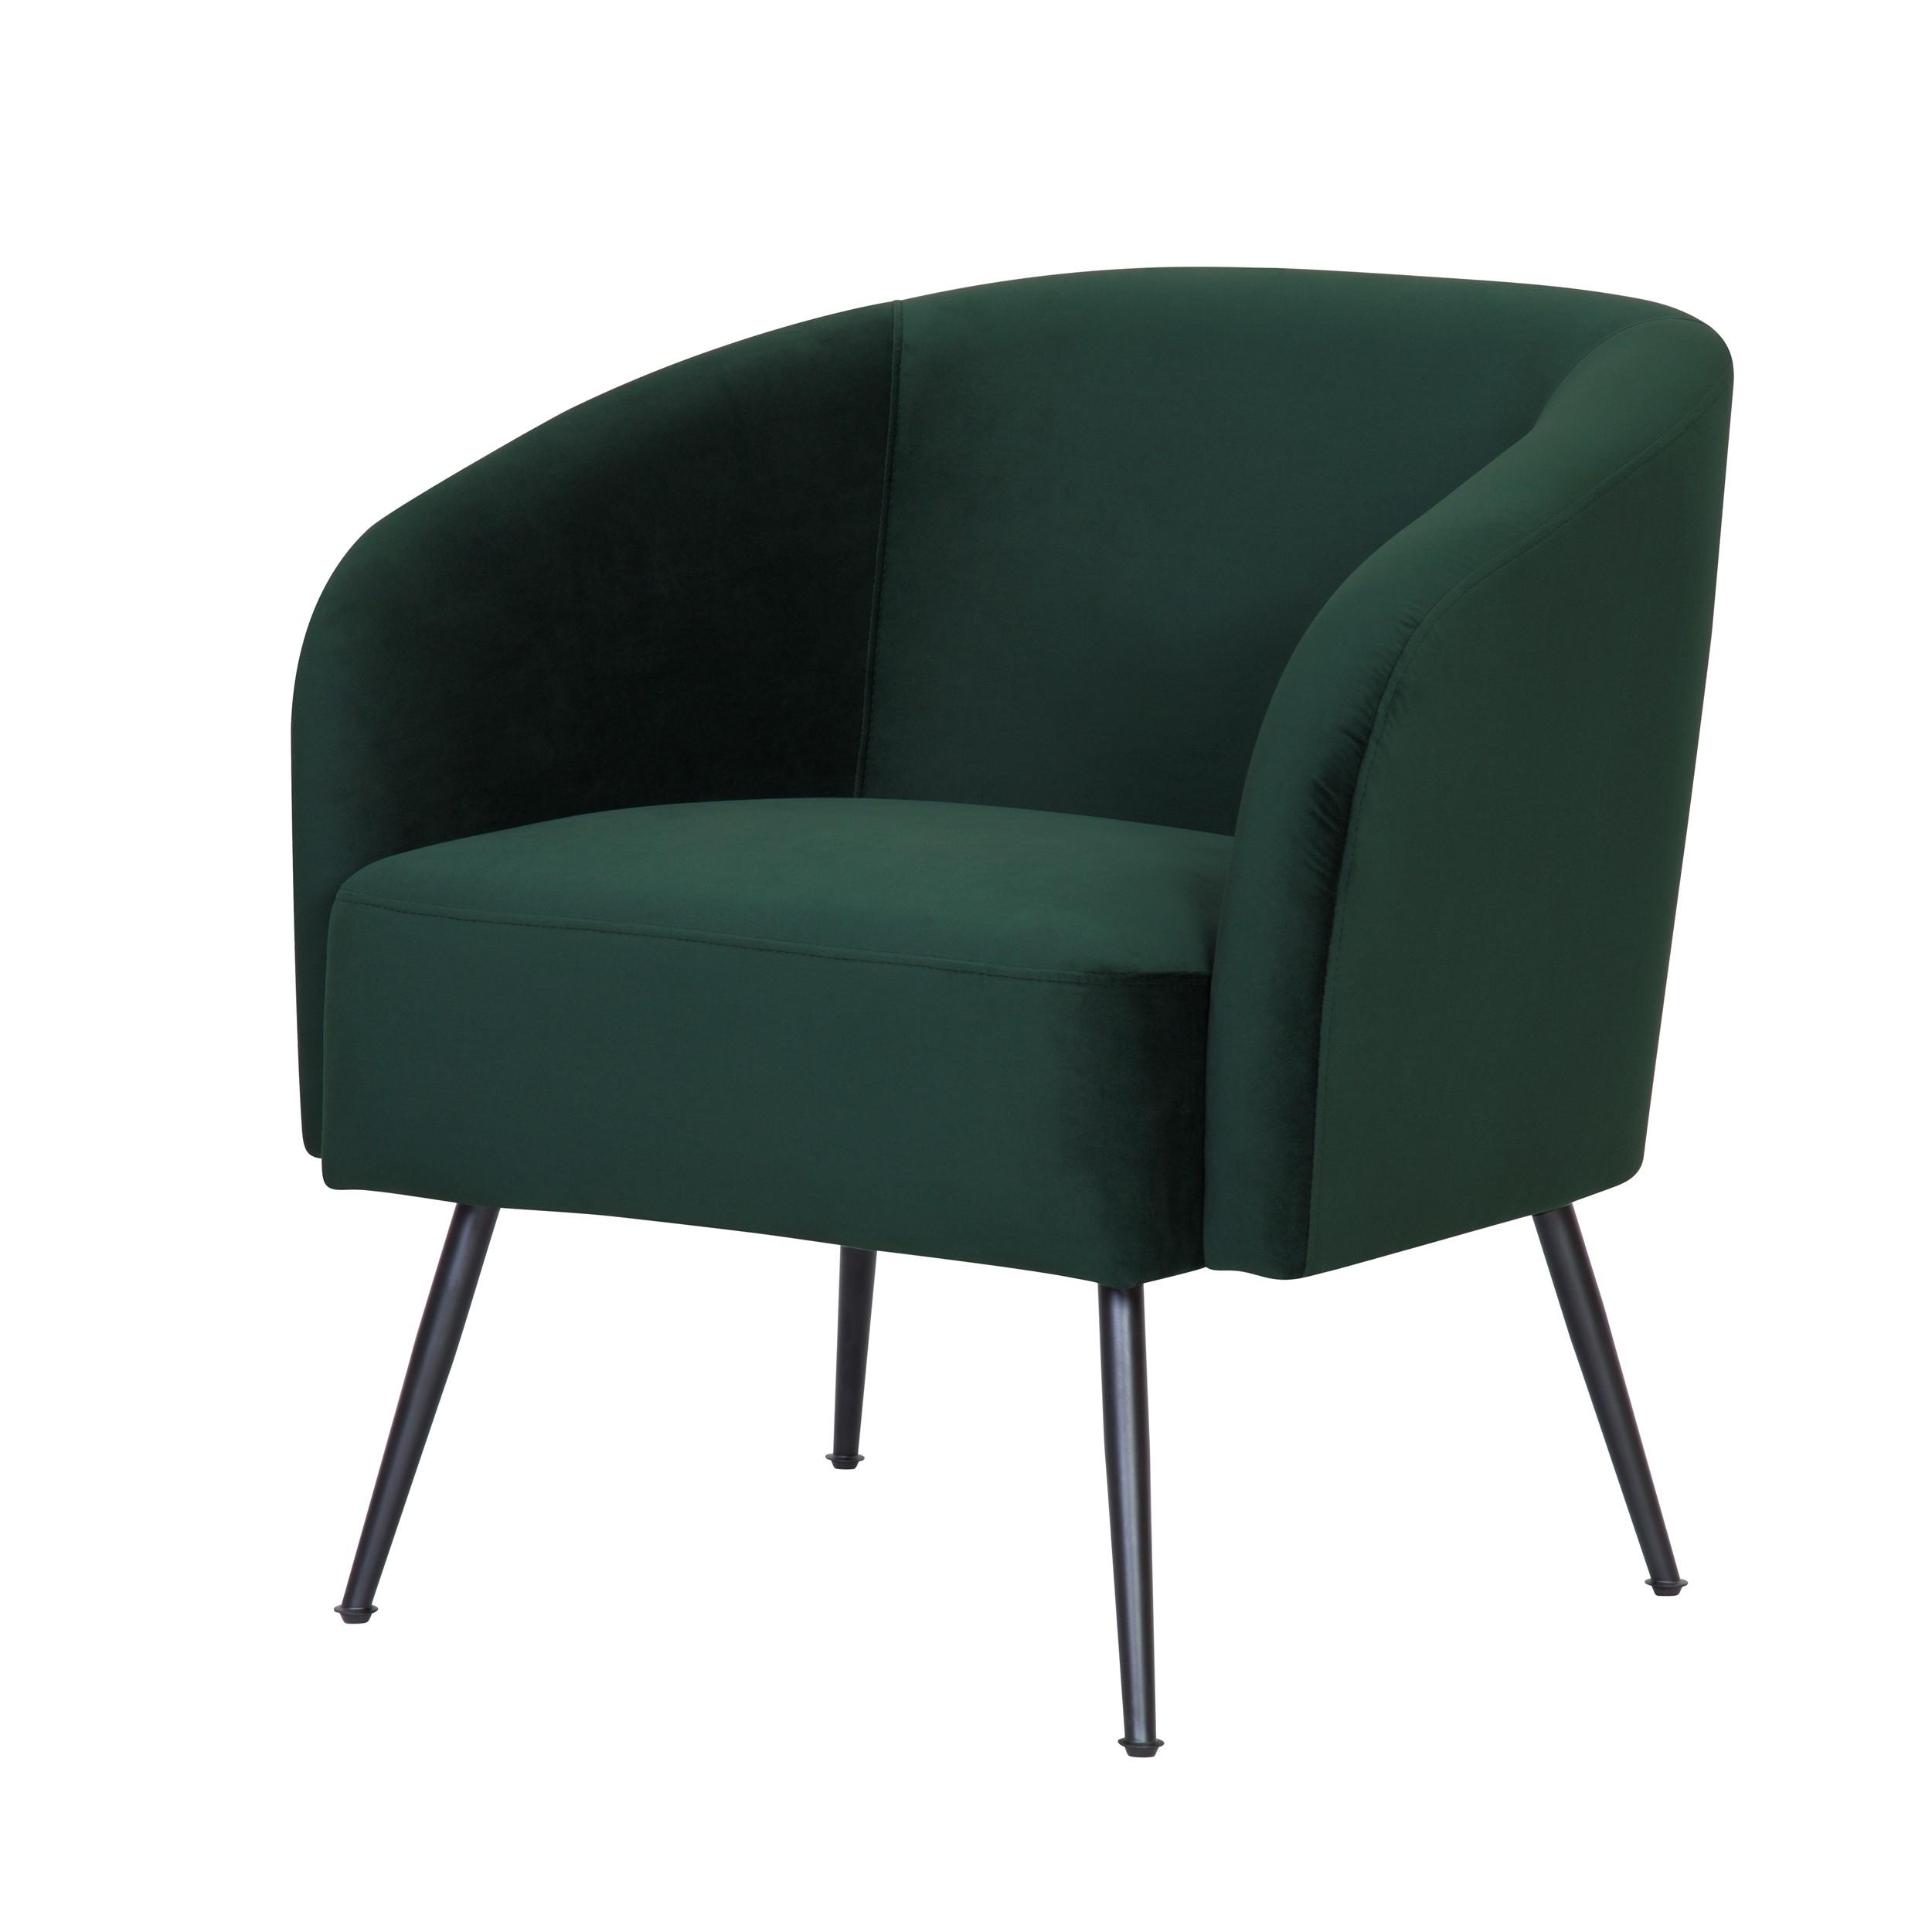 acheter fauteuil assise en velours vert pieds metal